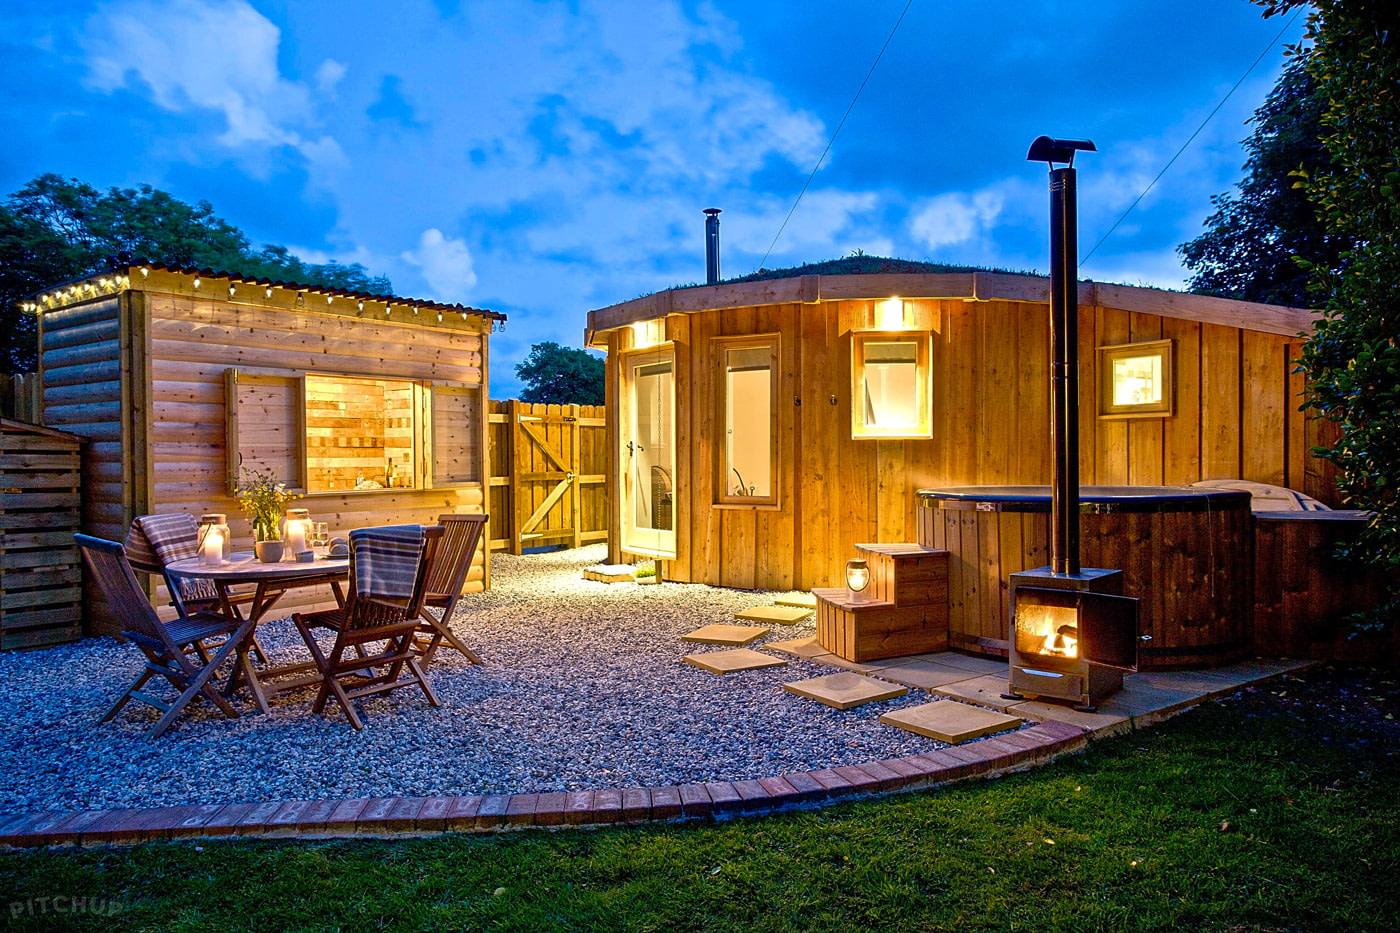 Yurt-shaped wooden cabin